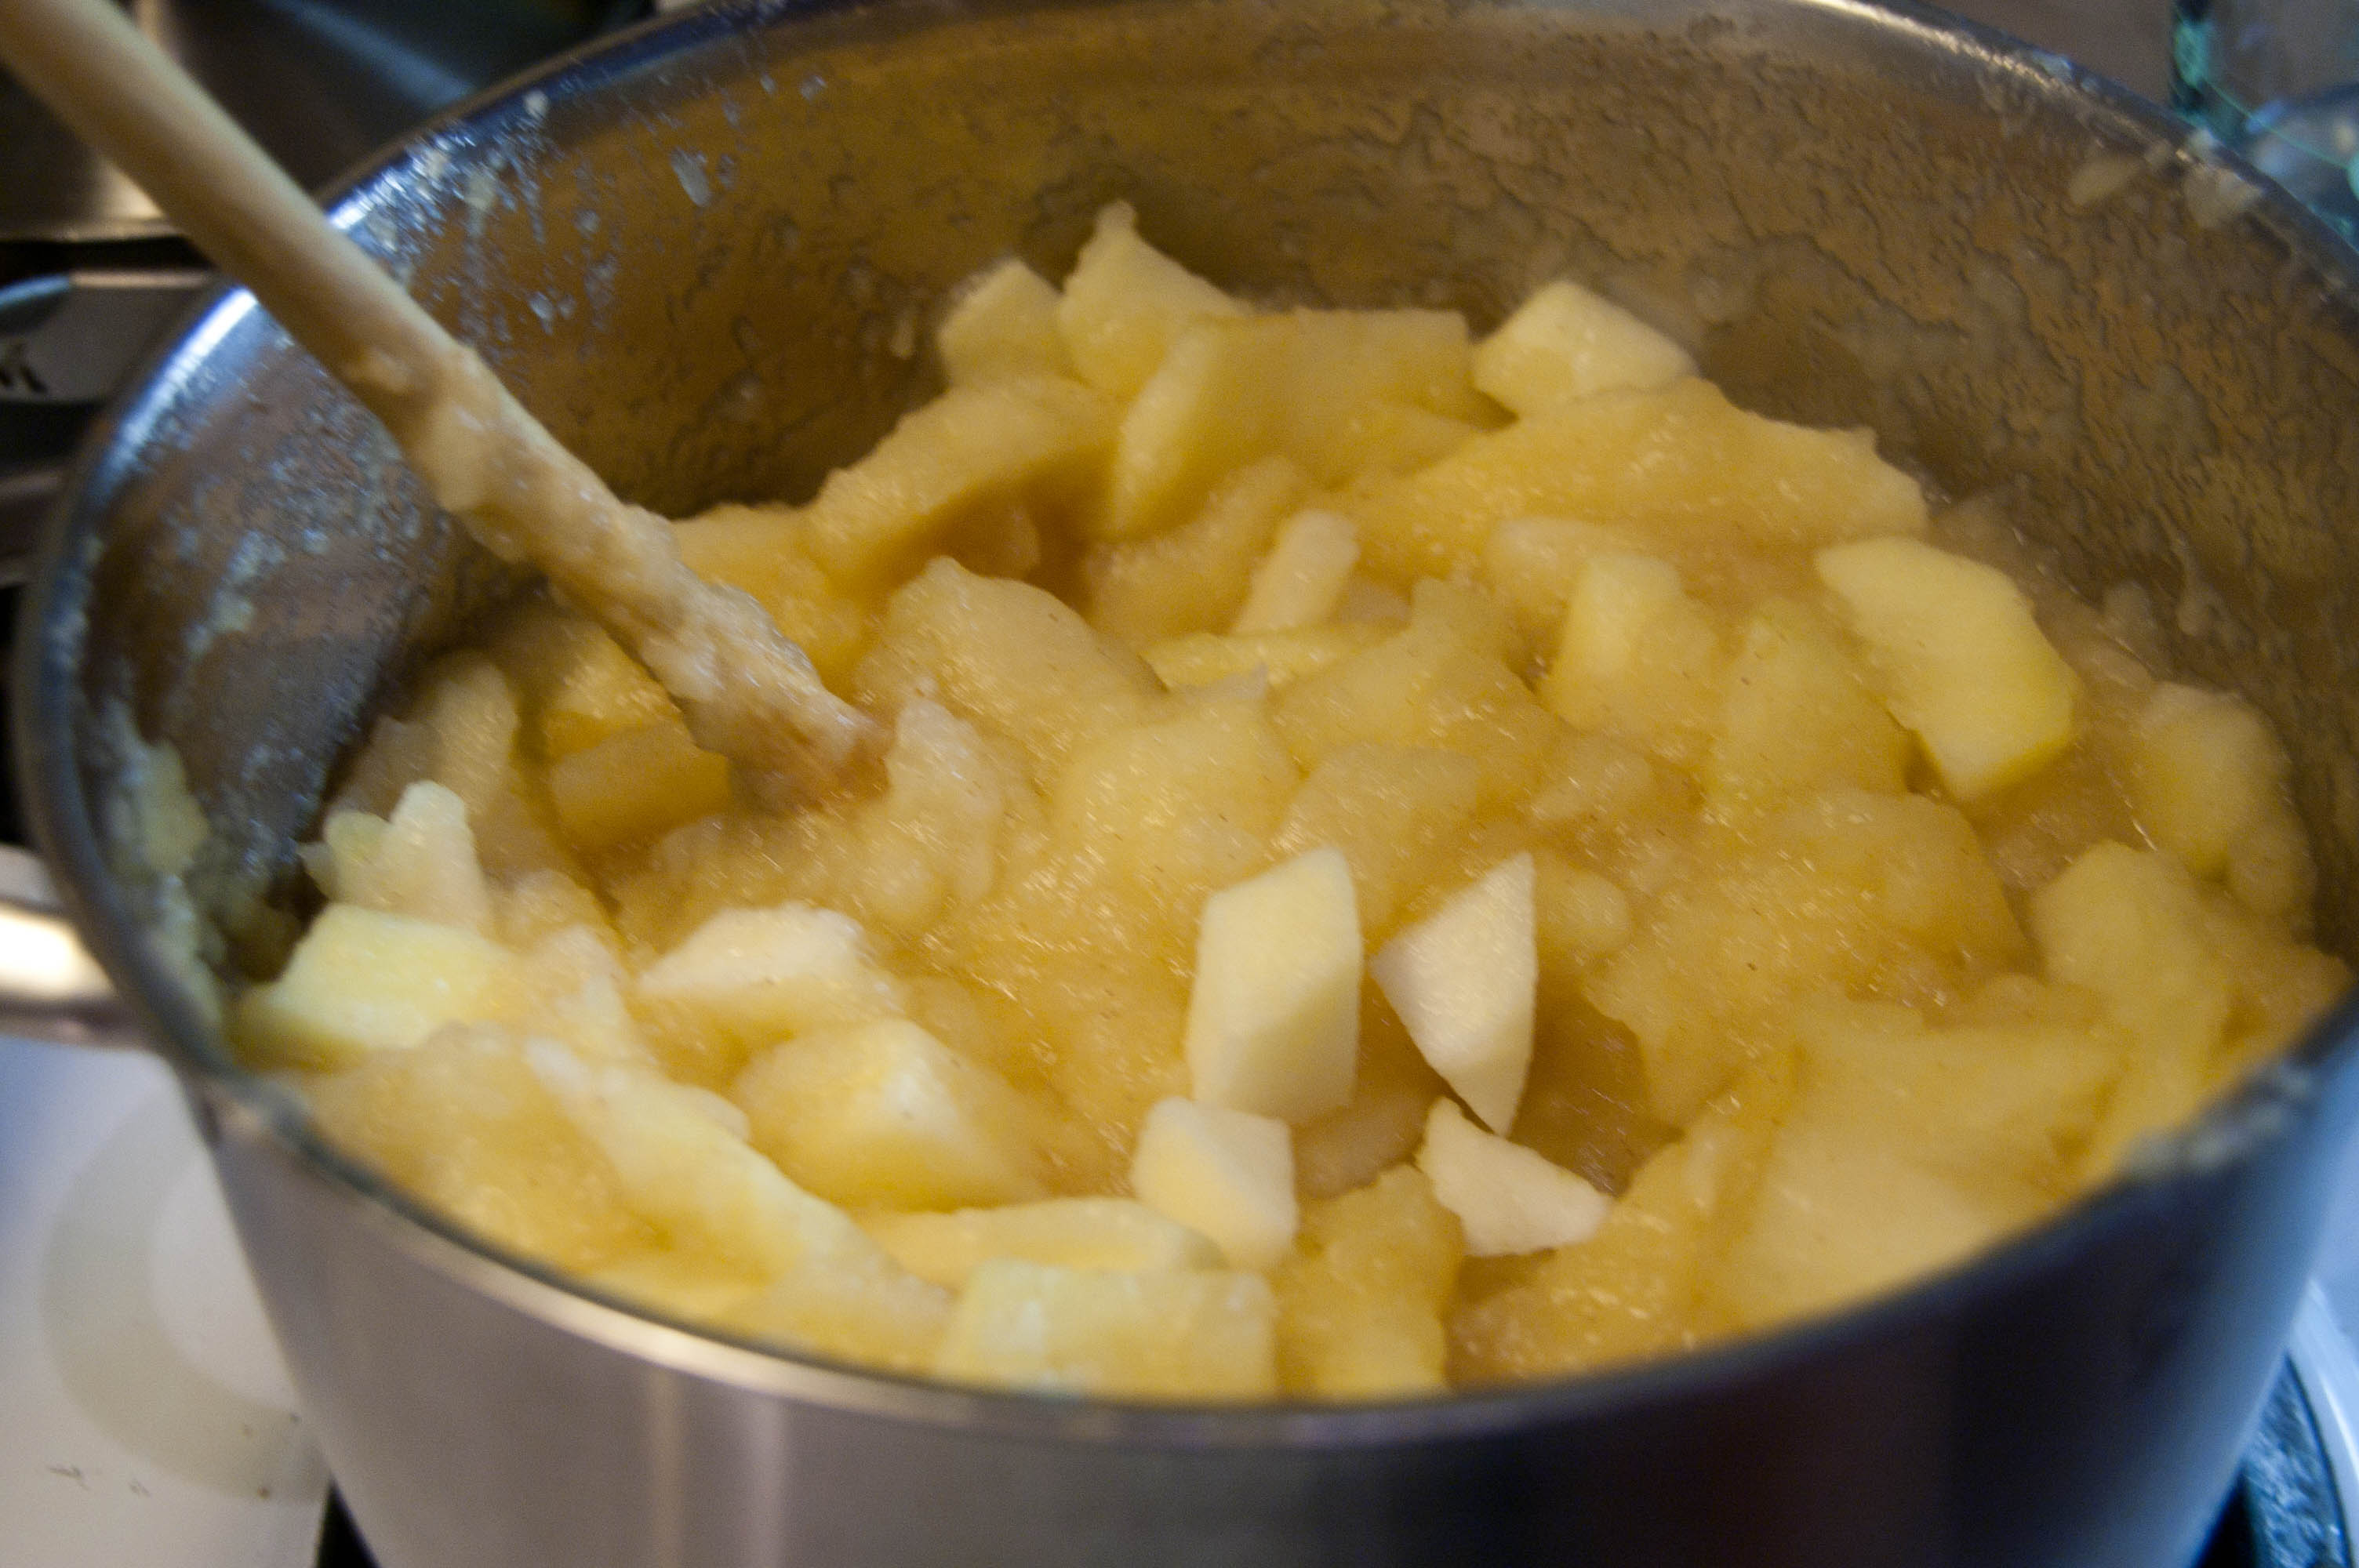 cuocere le mele